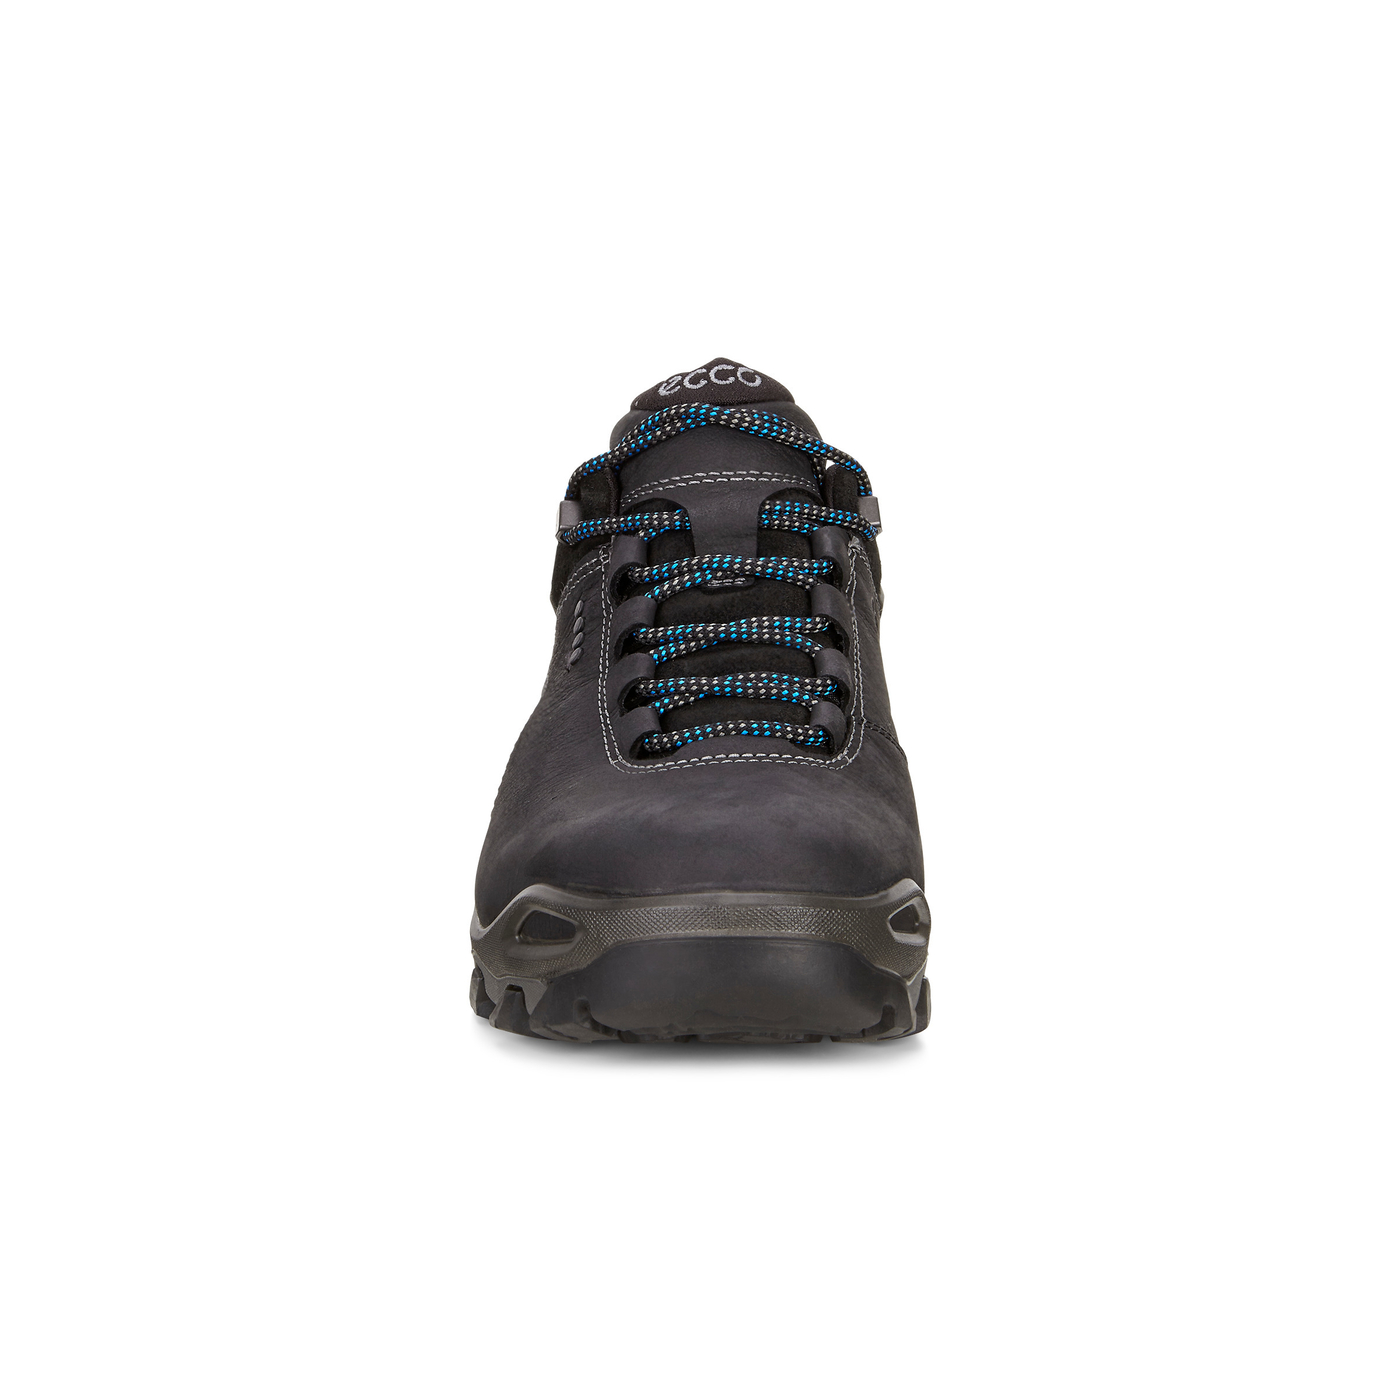 ECCO TERRA EVO Outdoor Shoe